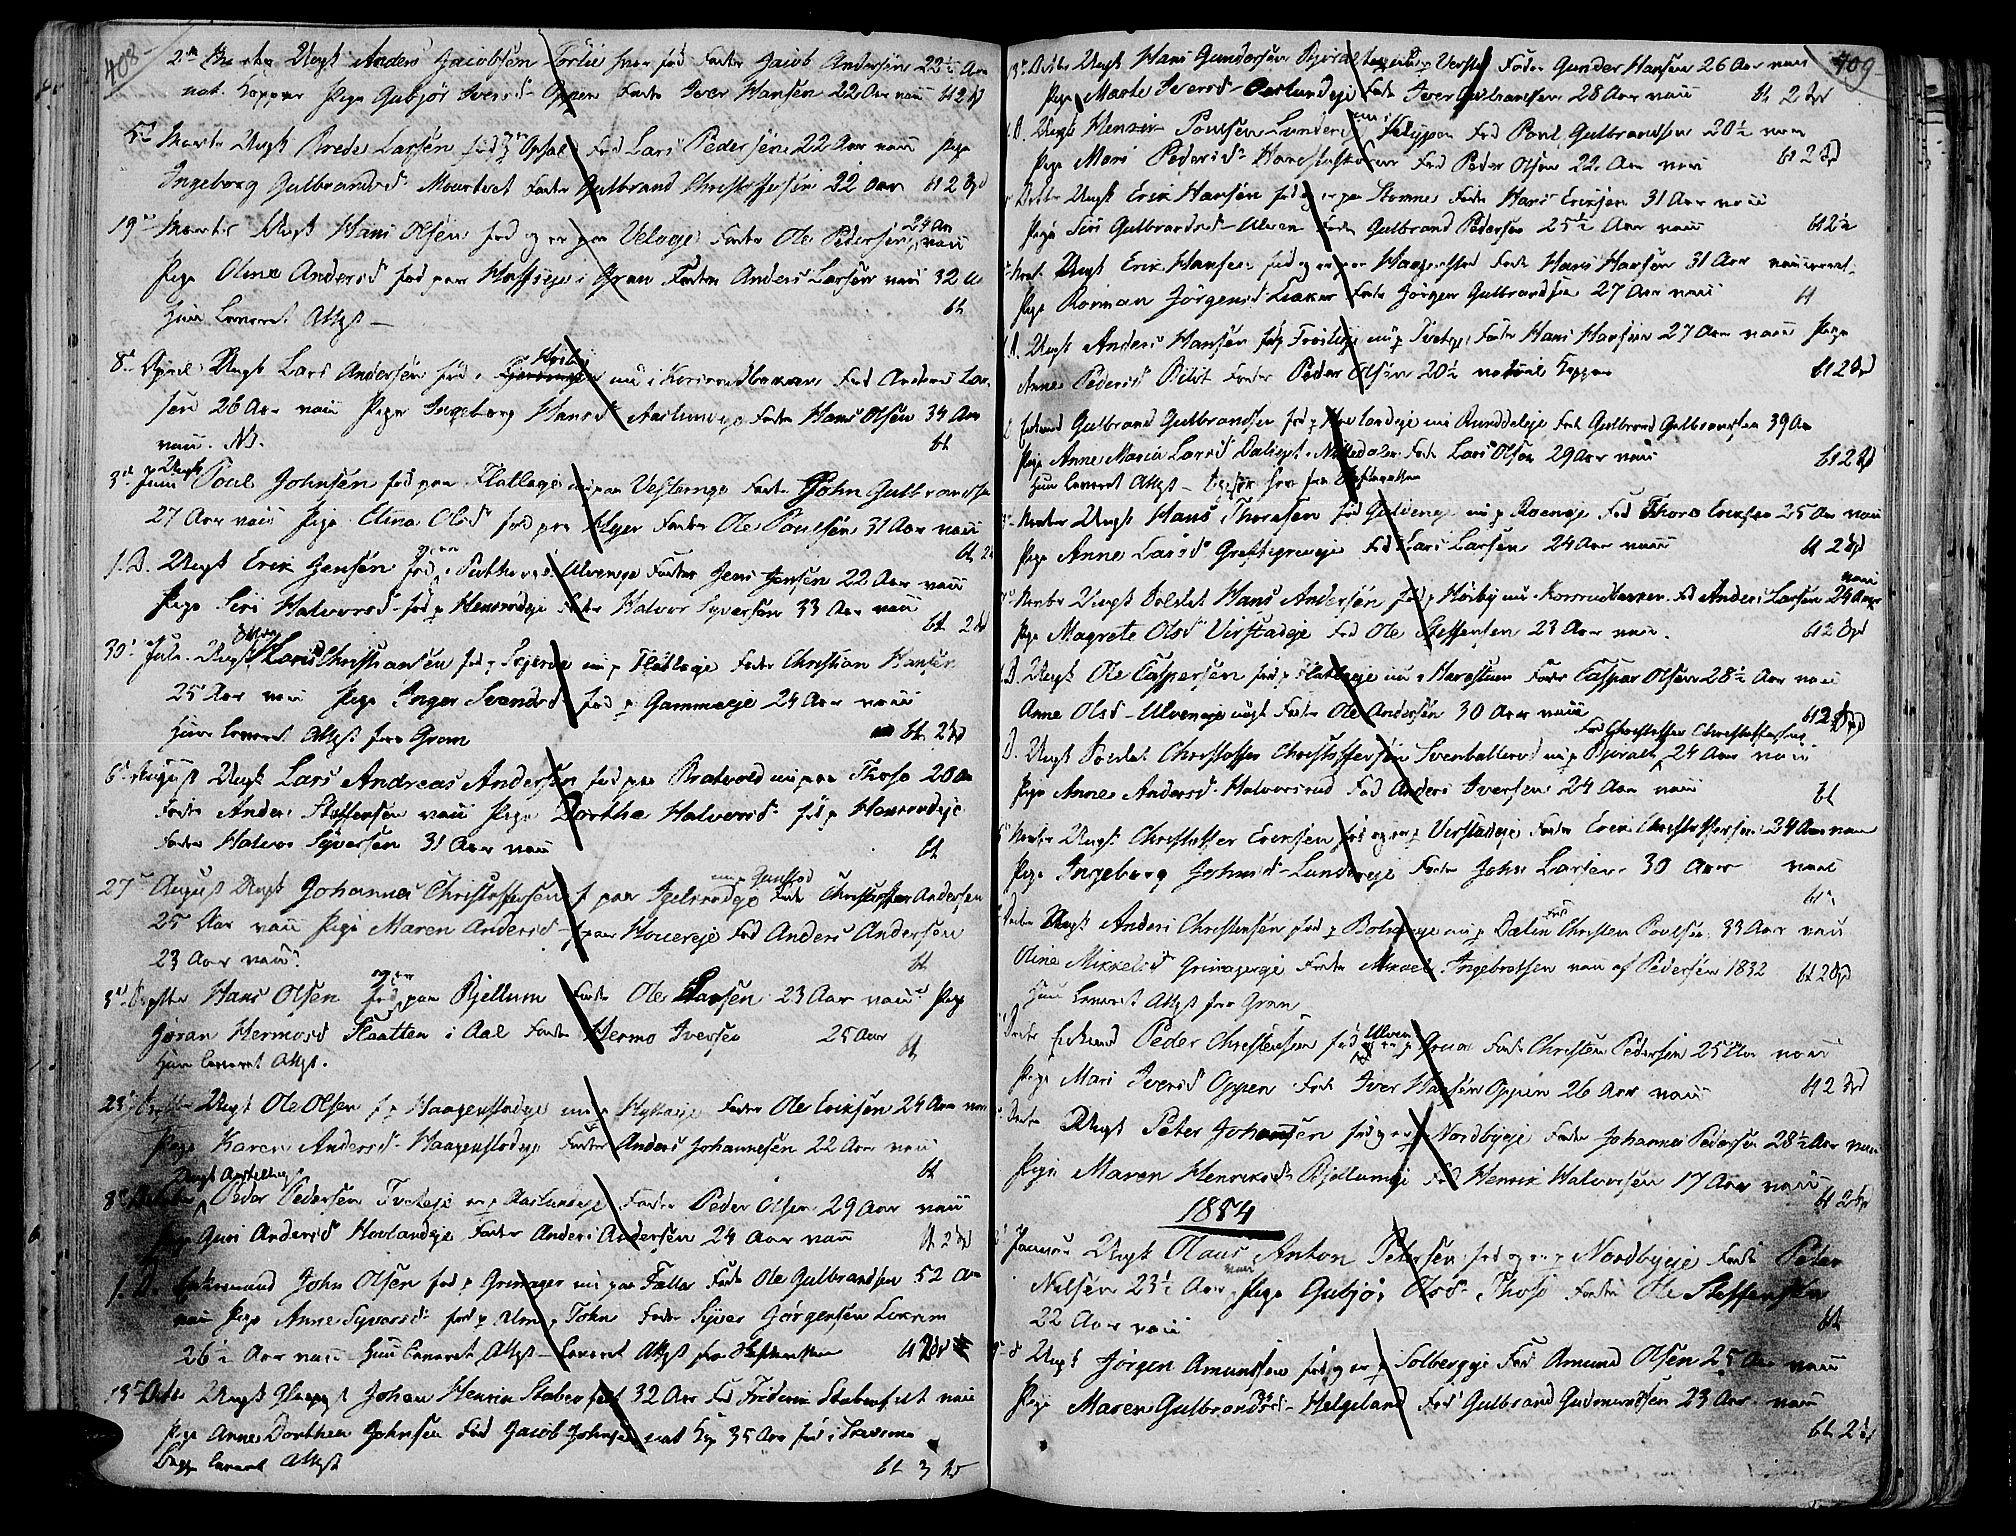 SAH, Jevnaker prestekontor, Ministerialbok nr. 4, 1800-1861, s. 408-409